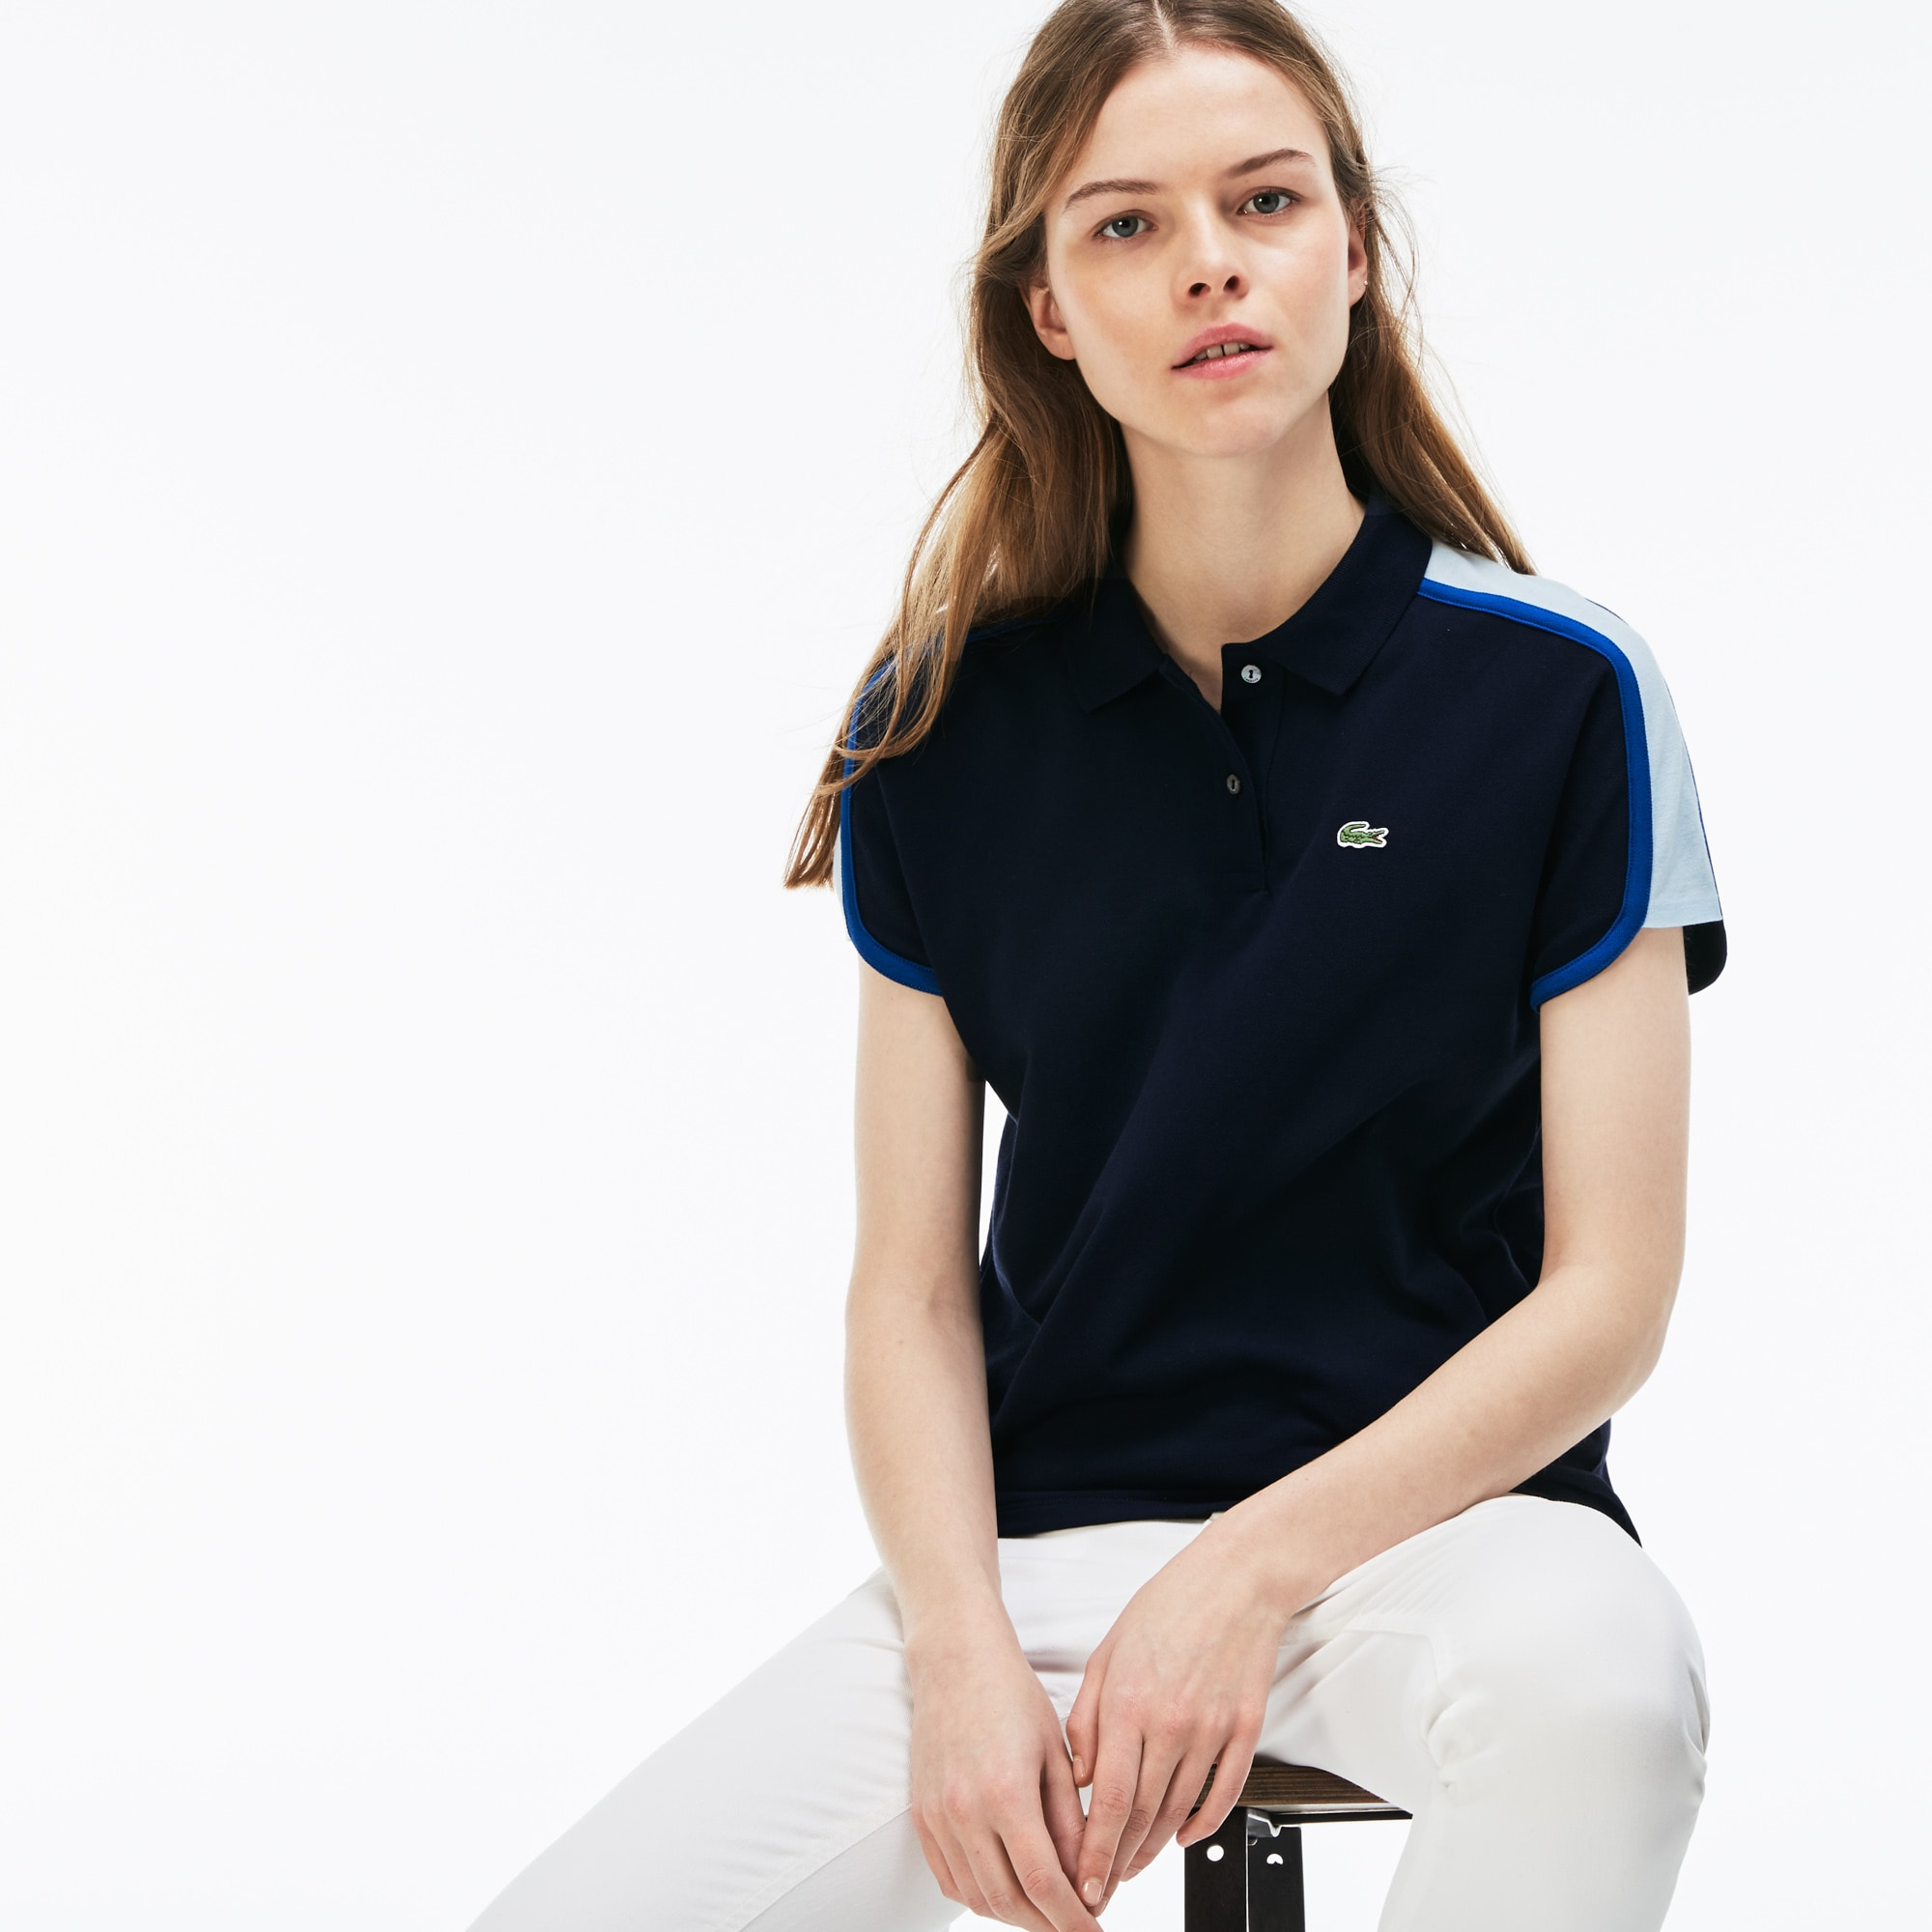 Women's Lacoste Latitude Made in France Colorblock Crepe Piqué Polo